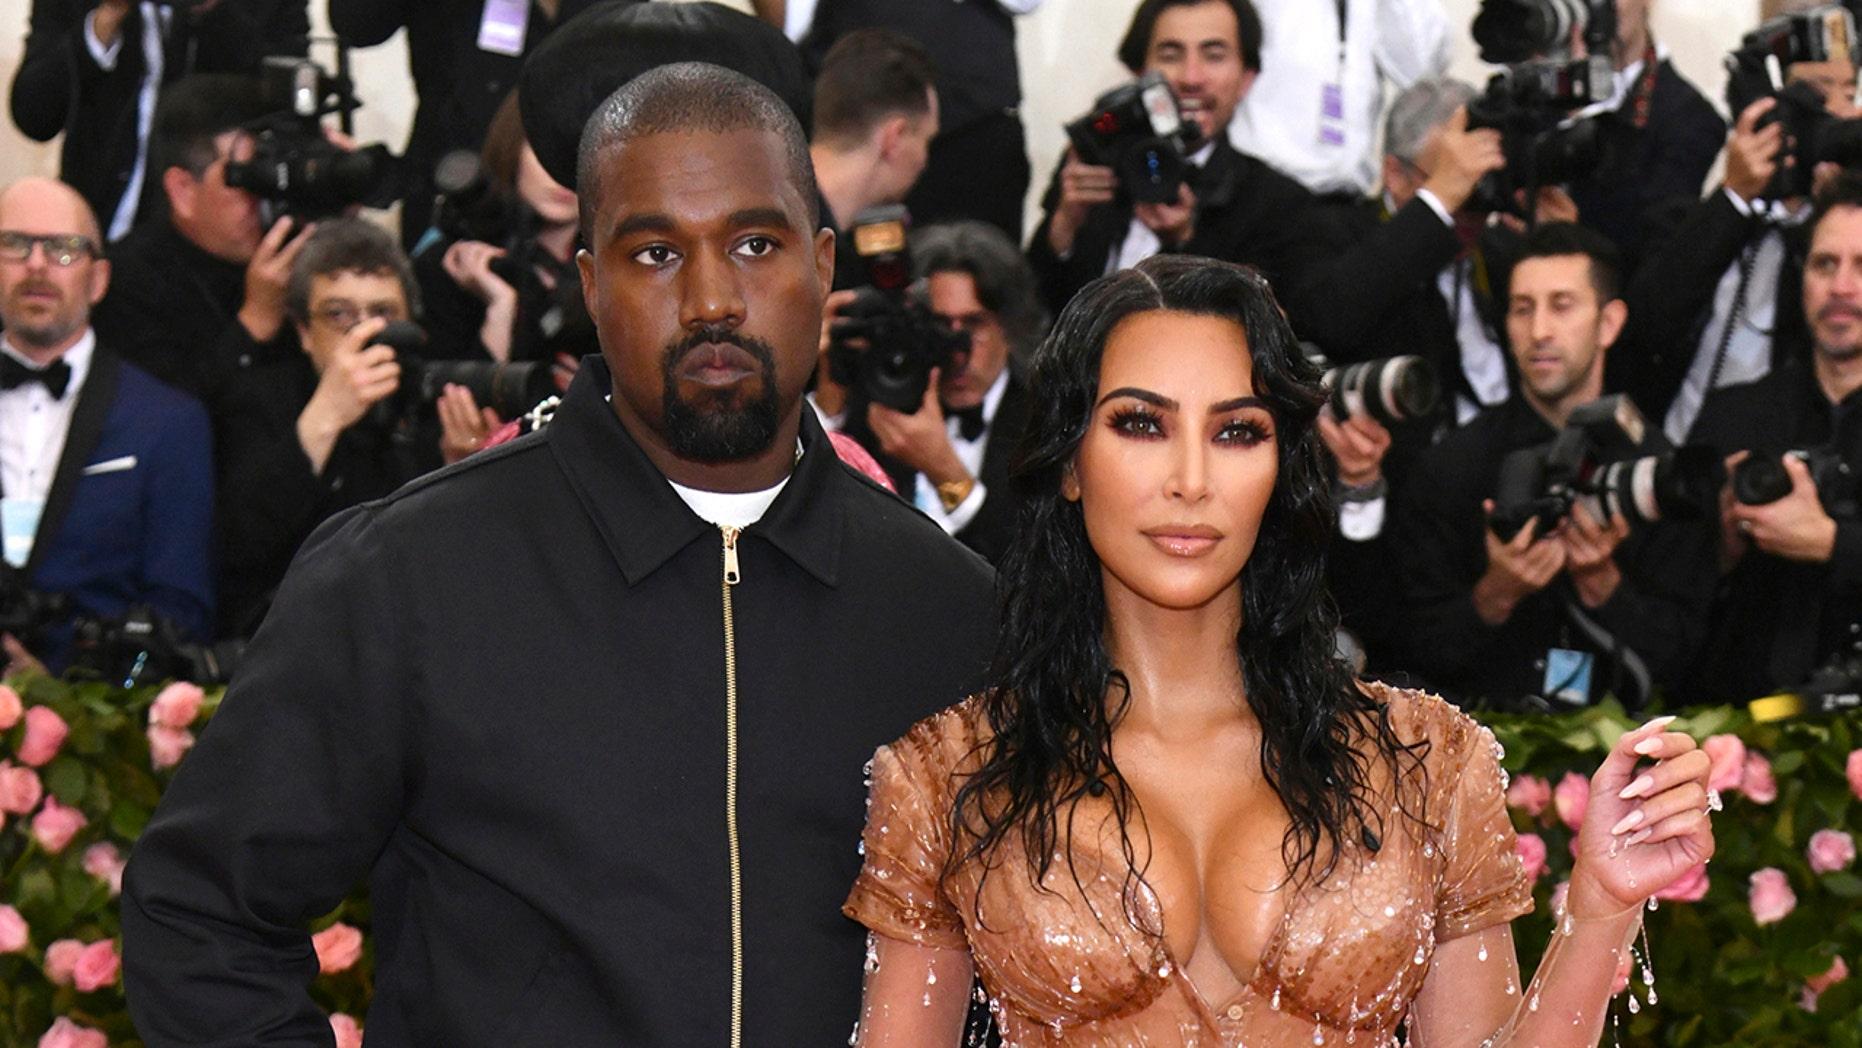 Kim Kardashian, Kanye West's divorce details revealed: reports